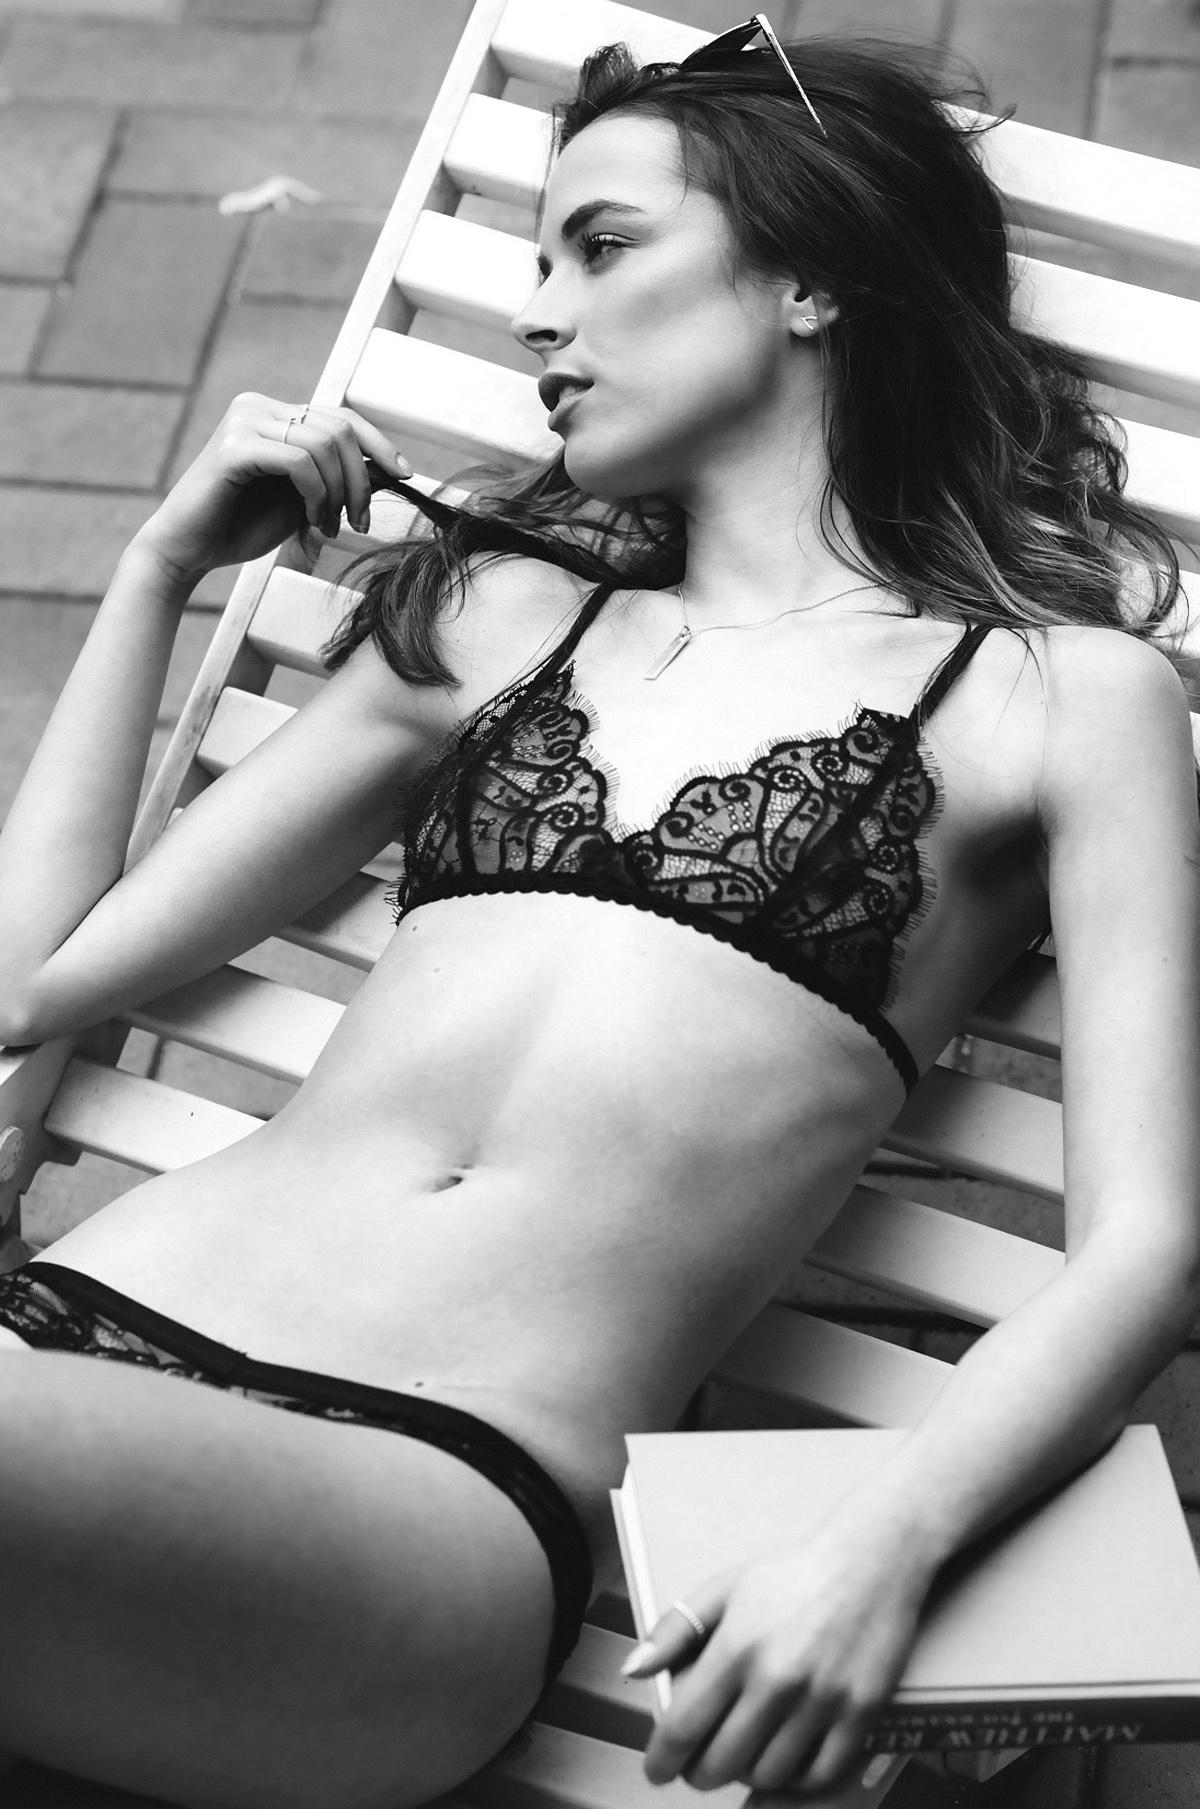 Is a cute Hot Monika Radulovic naked photo 2017